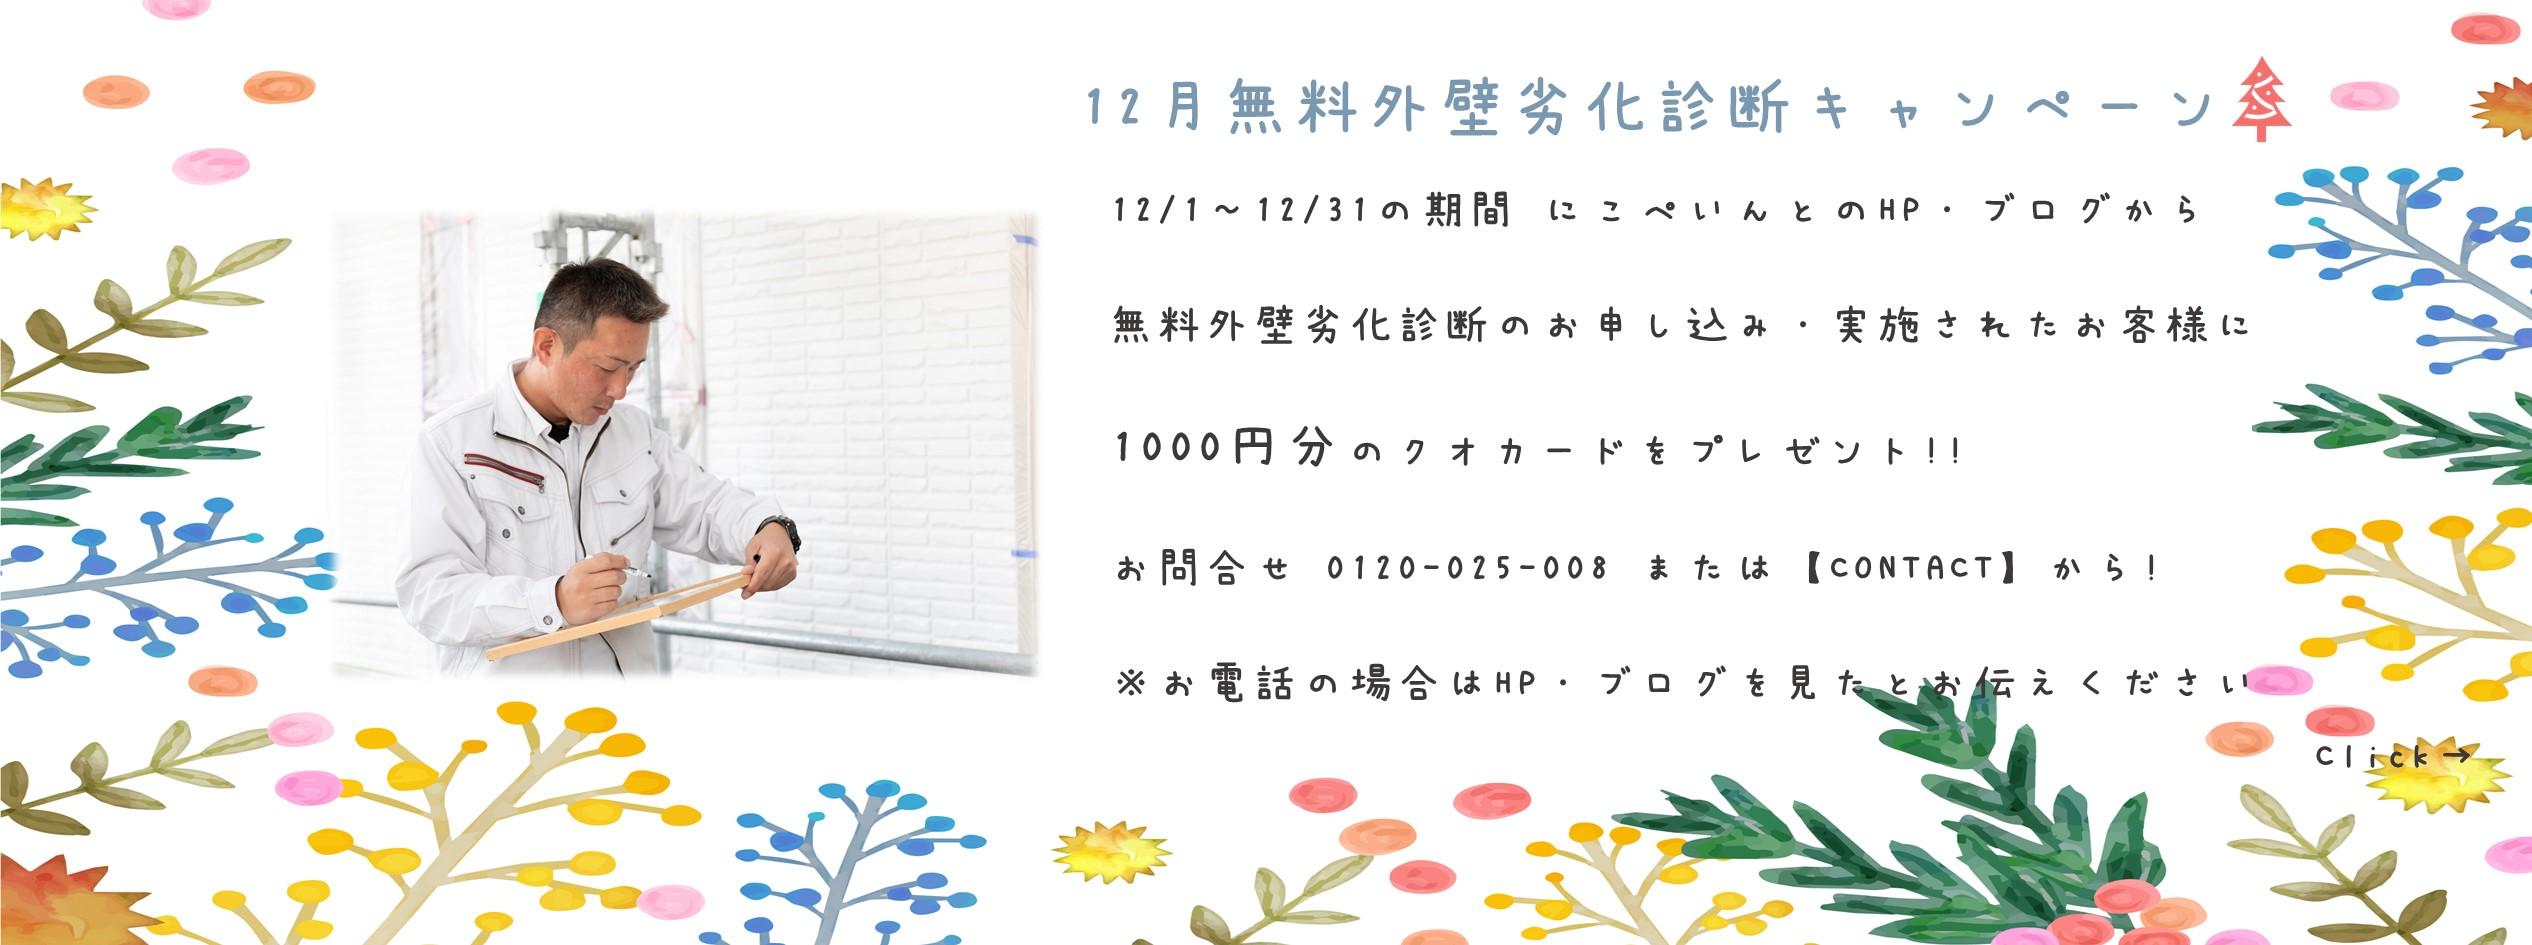 HPお知らせ用 12月(クリスマス)